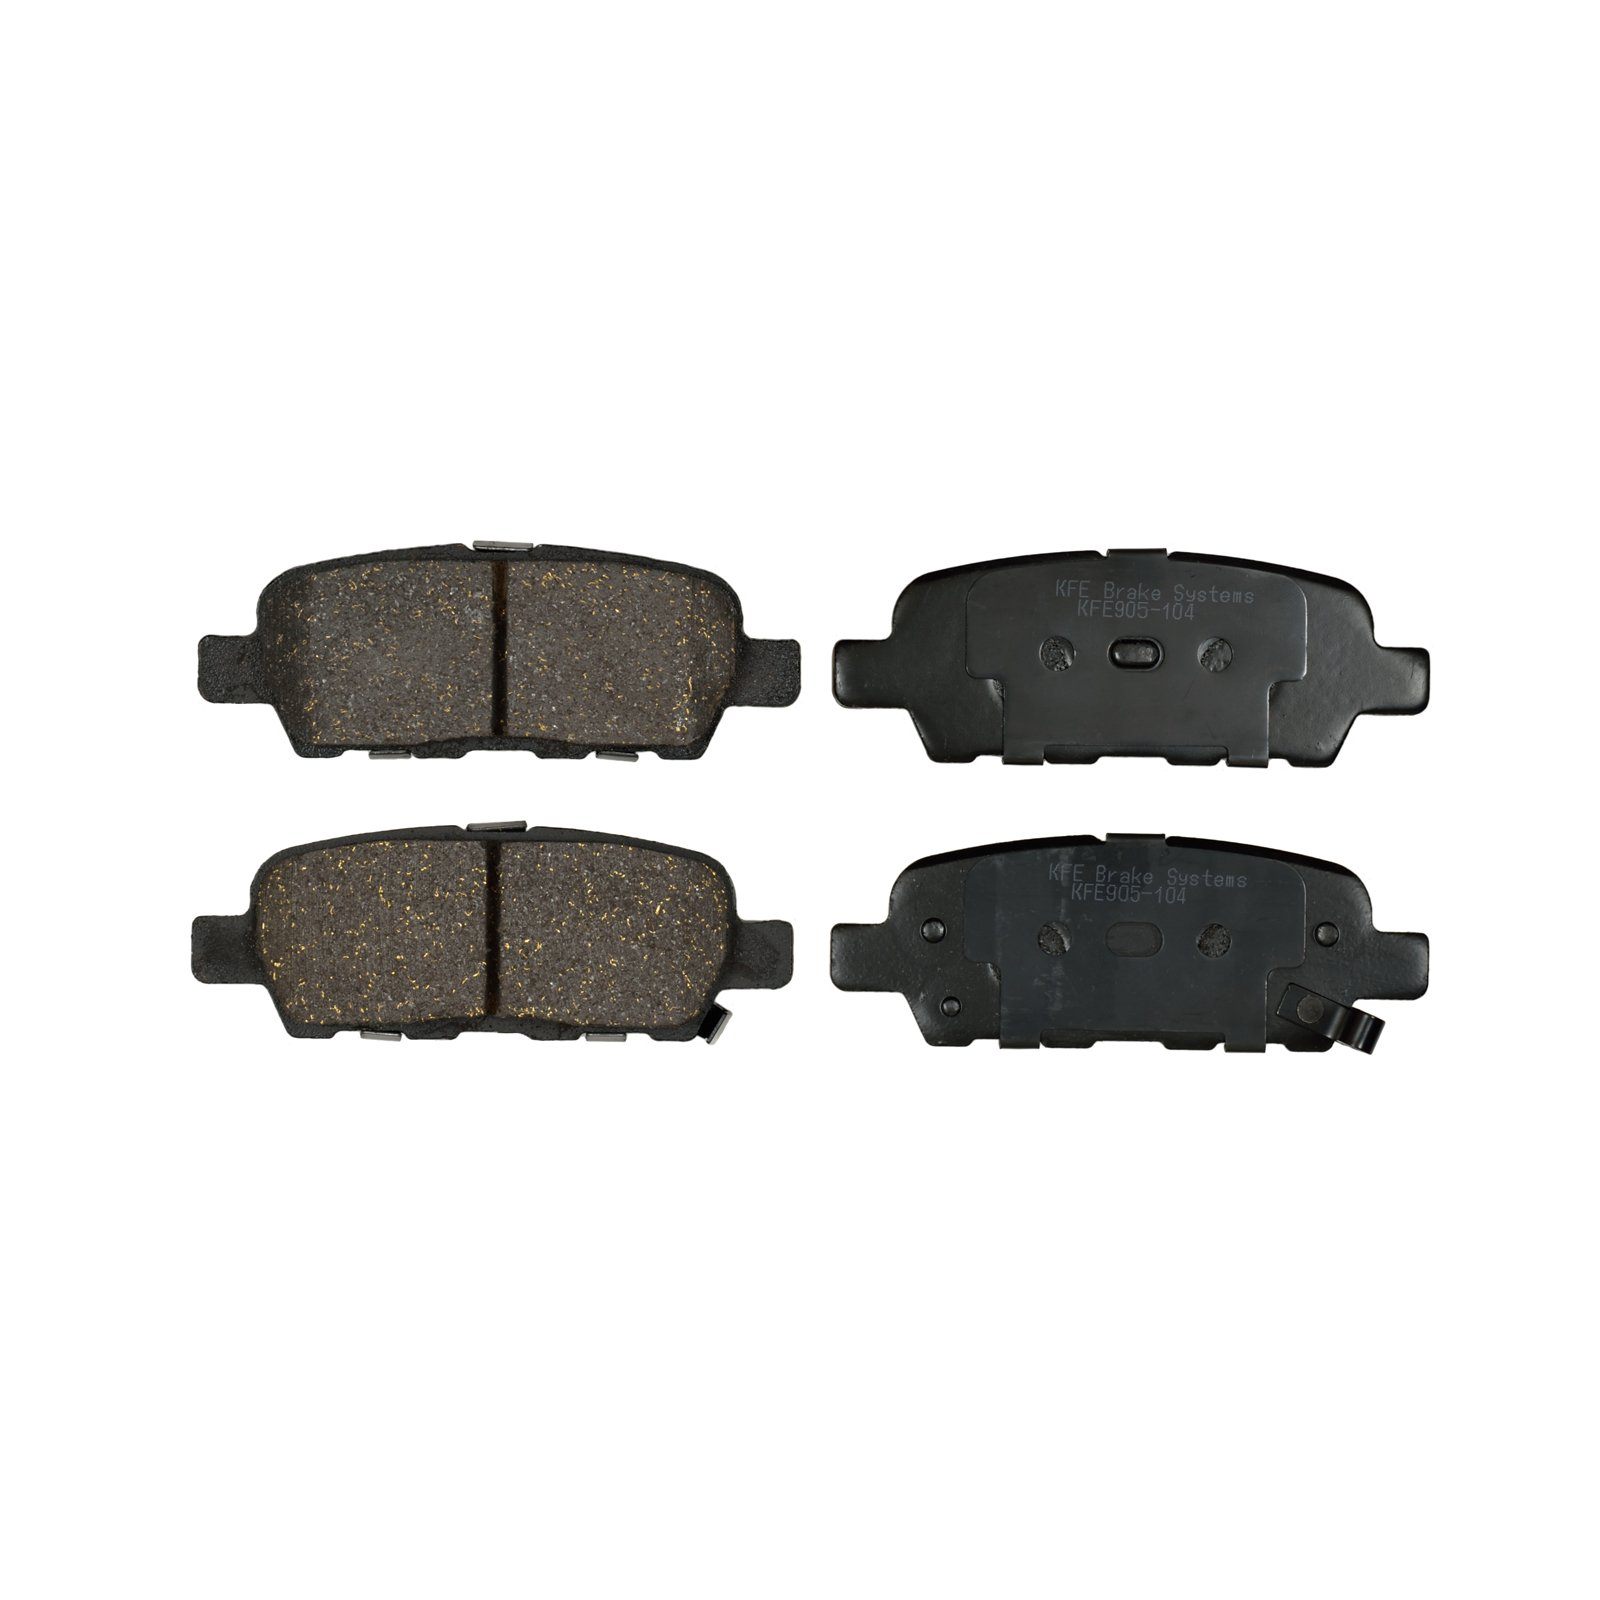 KFE Ultra Quiet Advanced KFE905-104 Premium Ceramic REAR Brake Pad Set